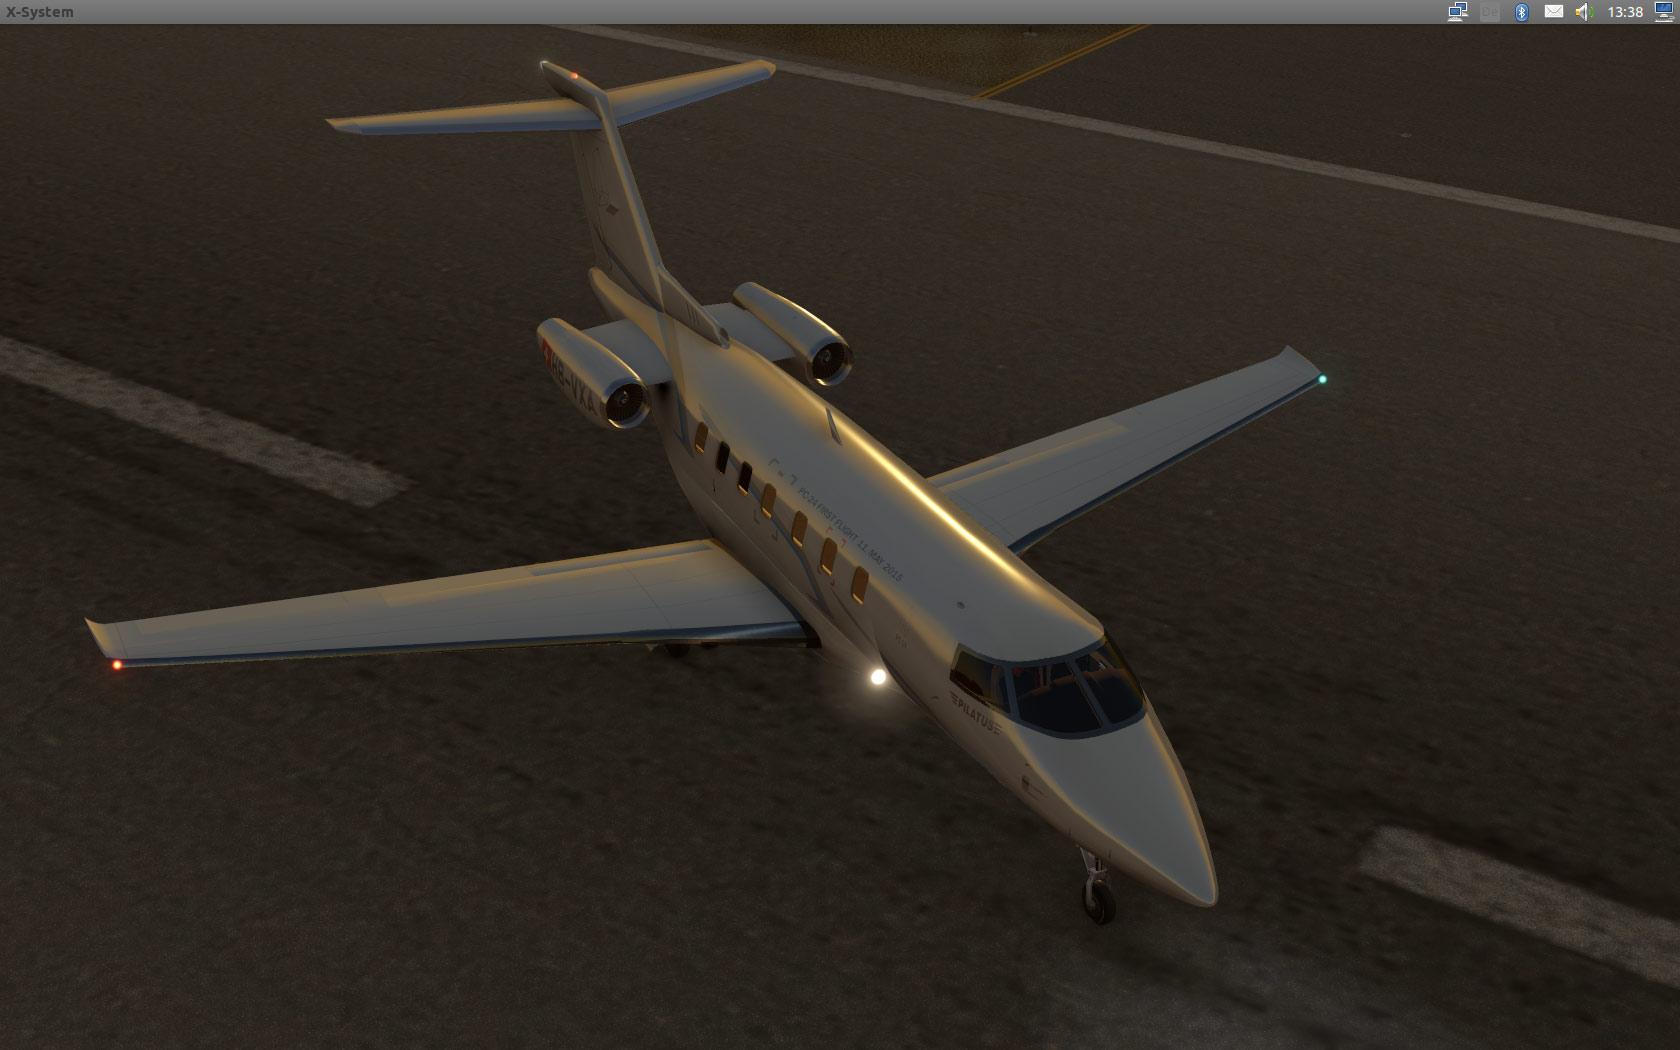 Pilatus PC-24 - The X-Plane General Discussions Forum - The